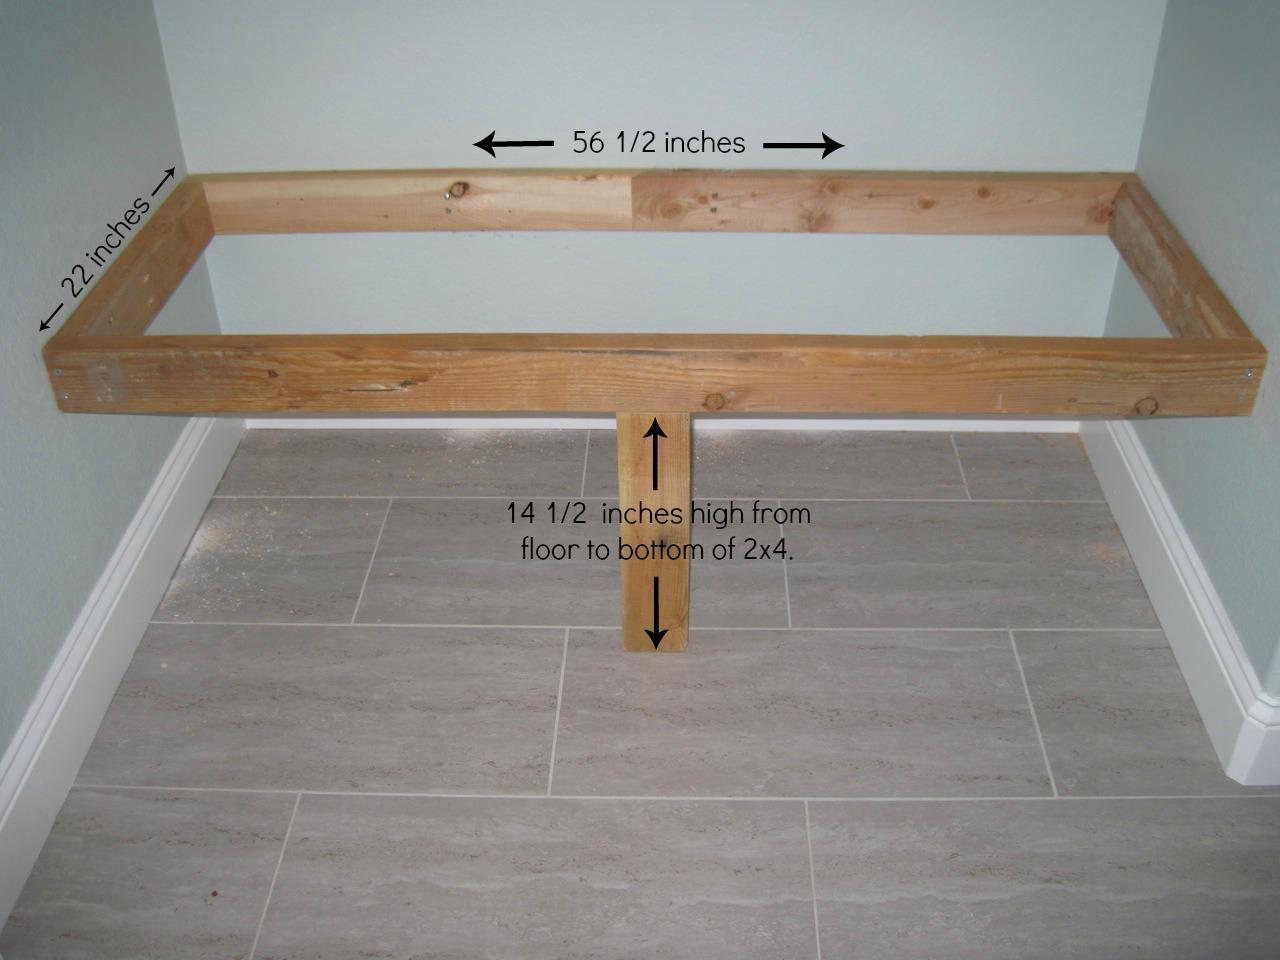 Woodwork Built In Bench Plans PDF Plans